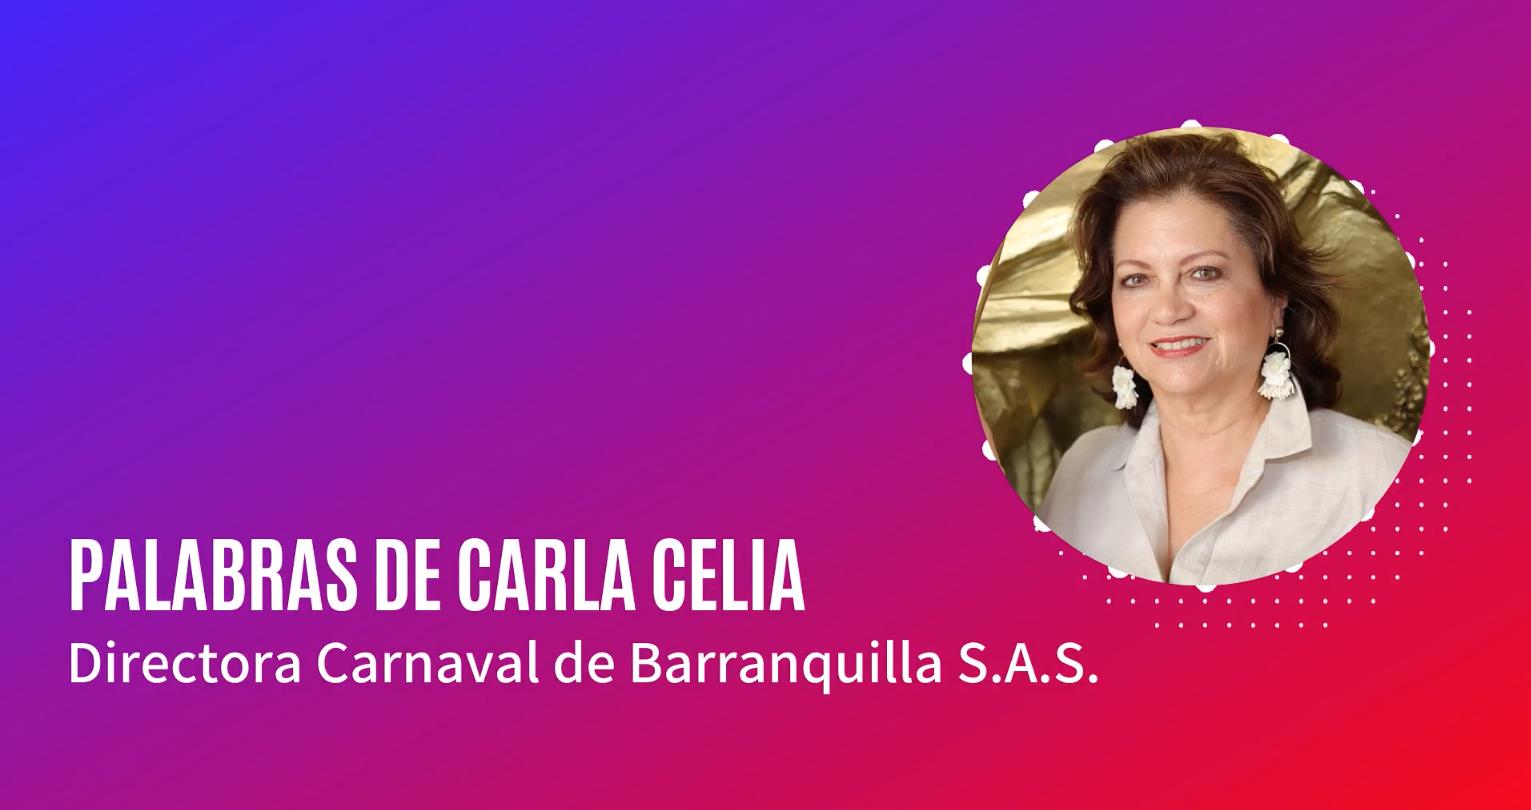 (PODCAST) Mensaje de Carla Celia, directora de Carnaval de Barranquilla SAS